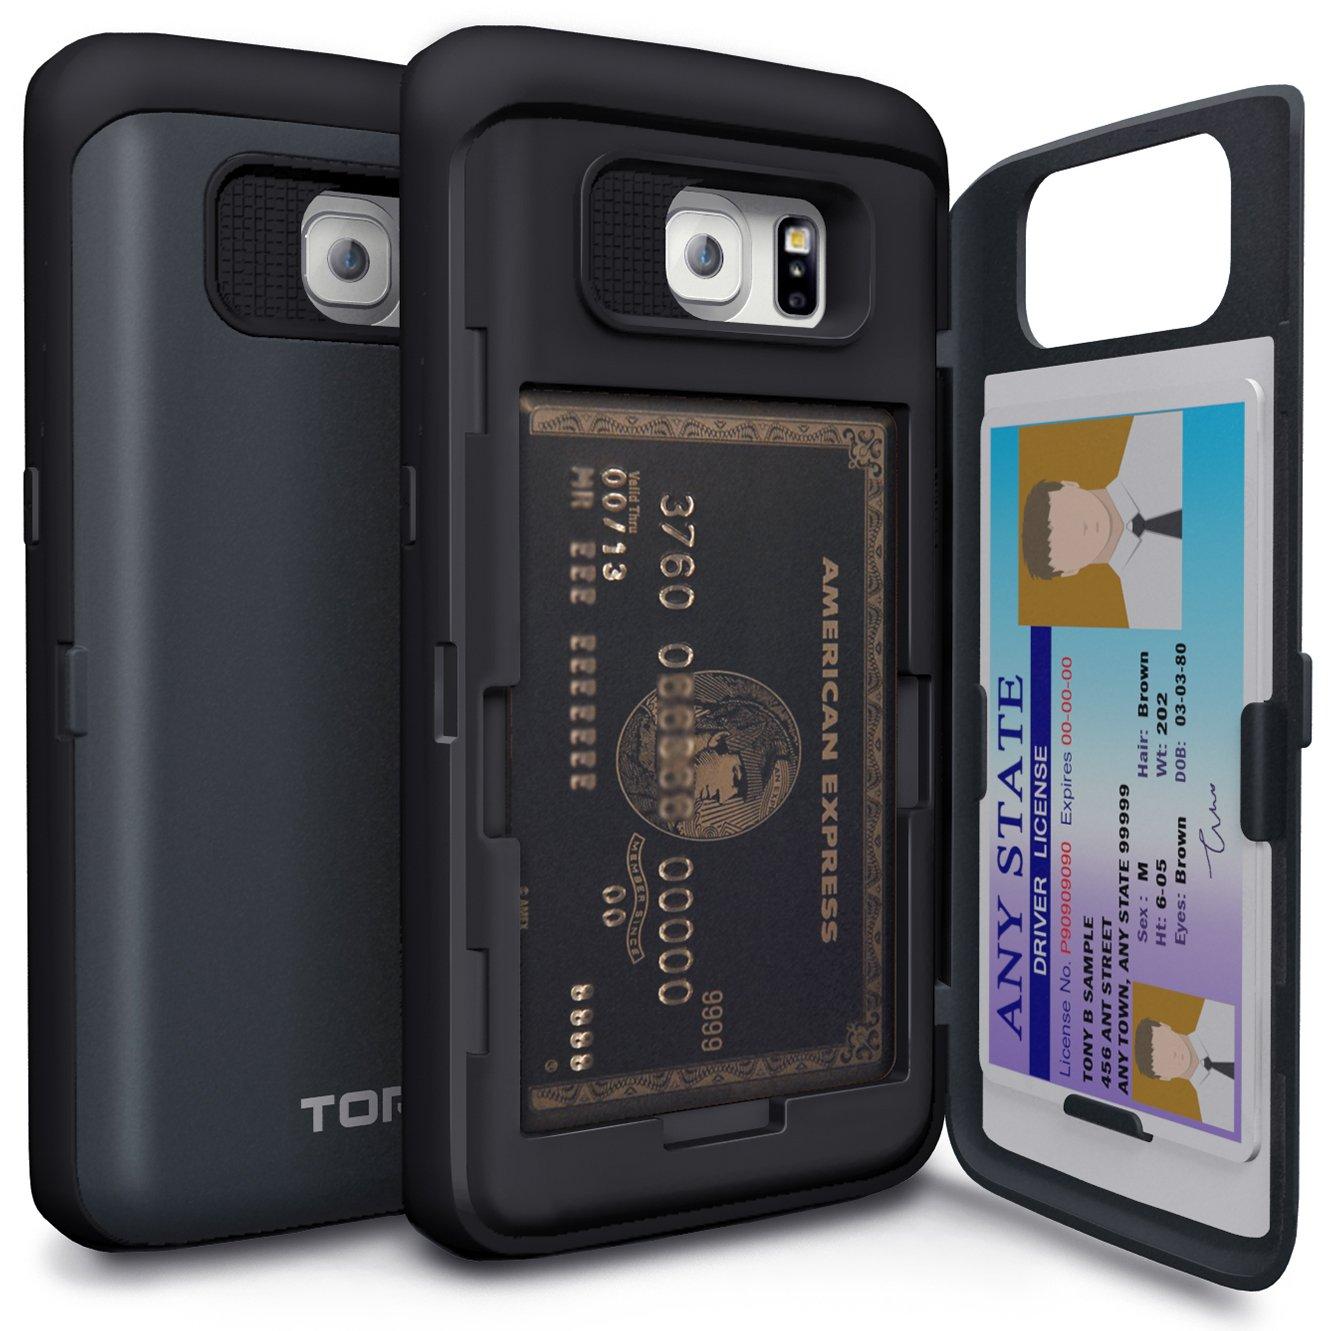 promo code 2c900 5f54d TORU CX PRO Galaxy S6 Edge Wallet Case Dark Blue with Hidden ID Slot Credit  Card Holder Hard Cover & Mirror for Samsung Galaxy S6 Edge - Metal Slate